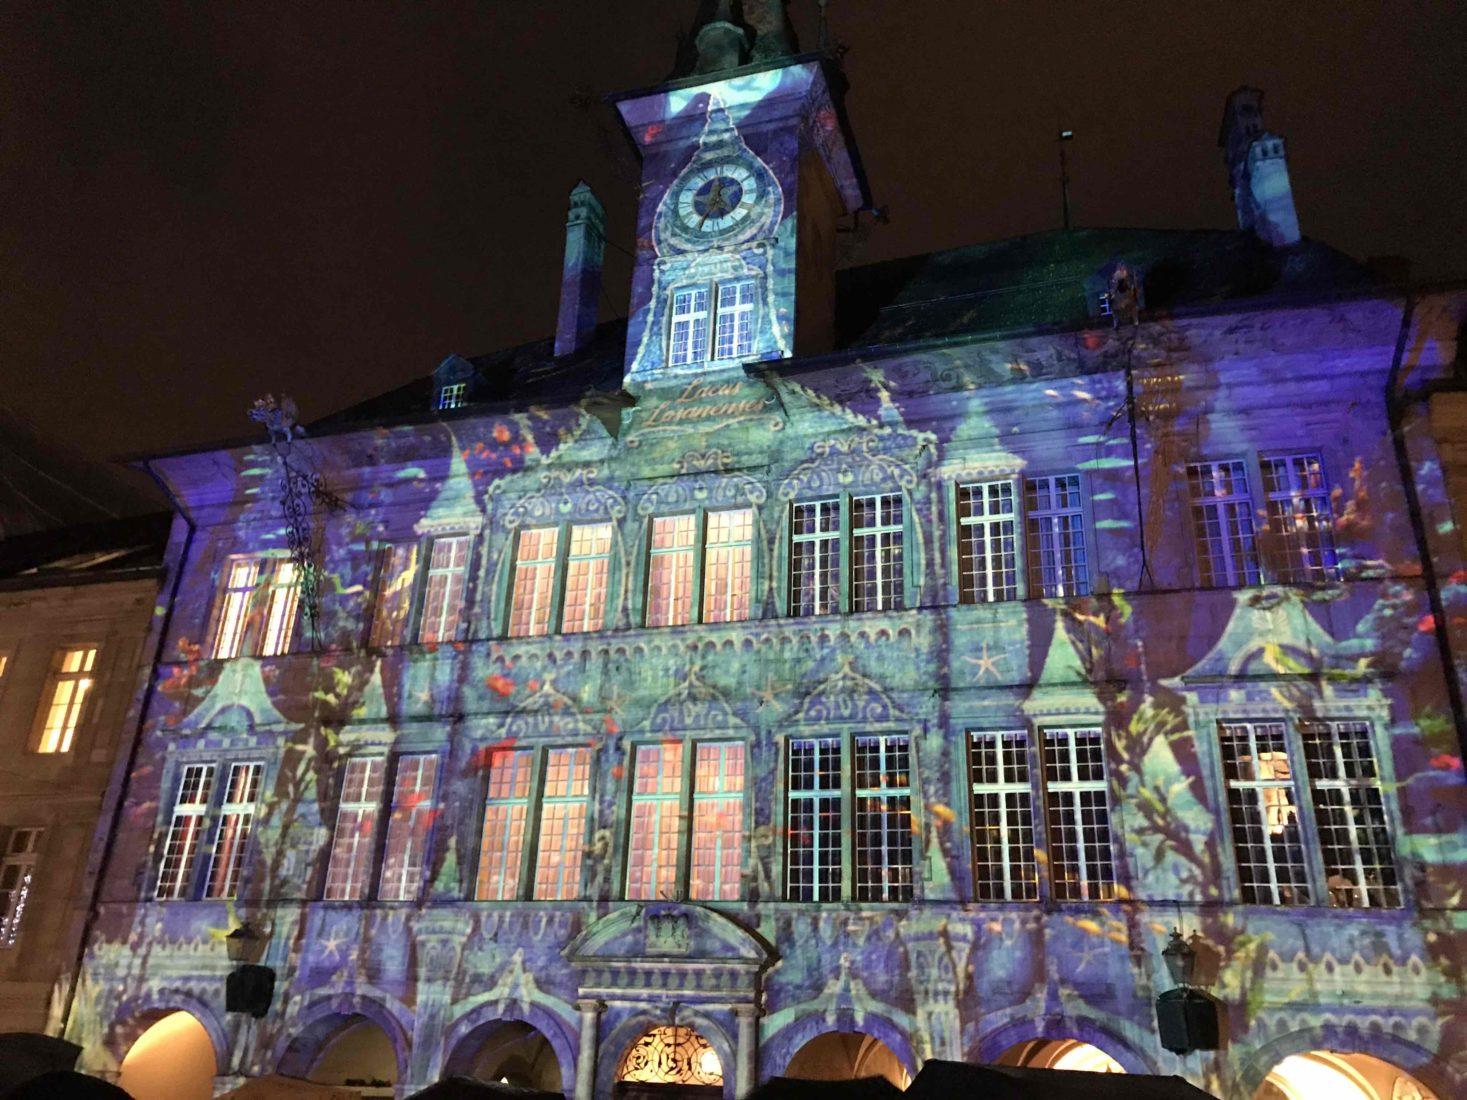 Bônoel Lausanne 2018 façade hotel de ville multicolore